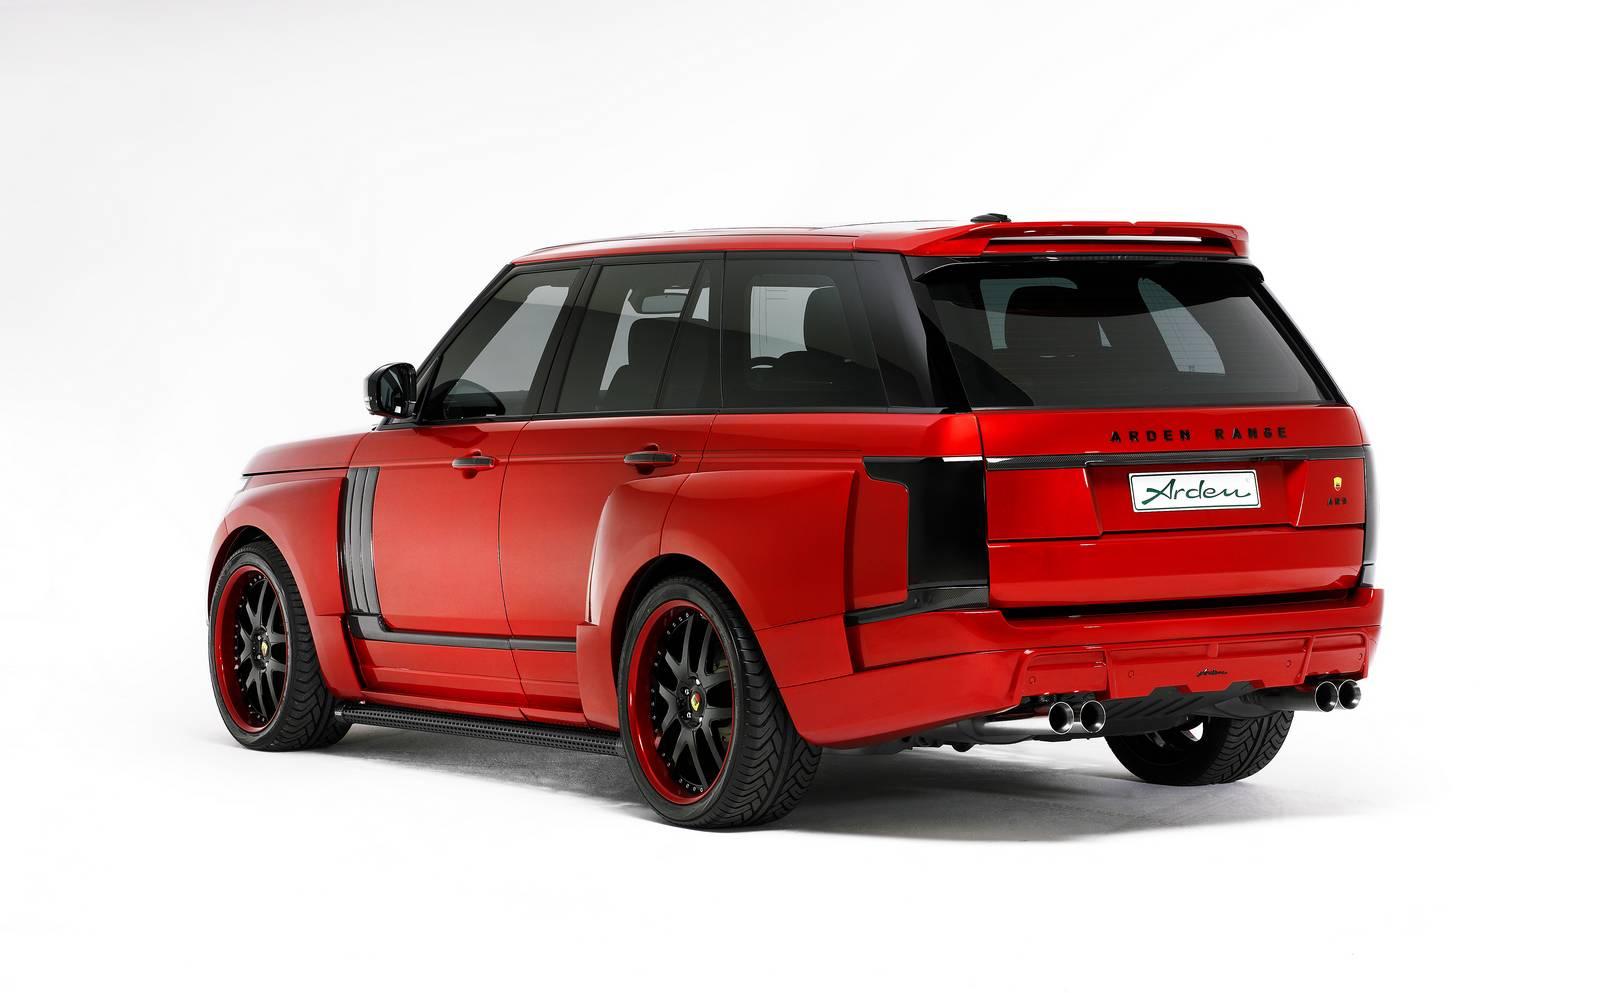 Range Rover AR 9 Spirit Special Edition тюнинг от Arden